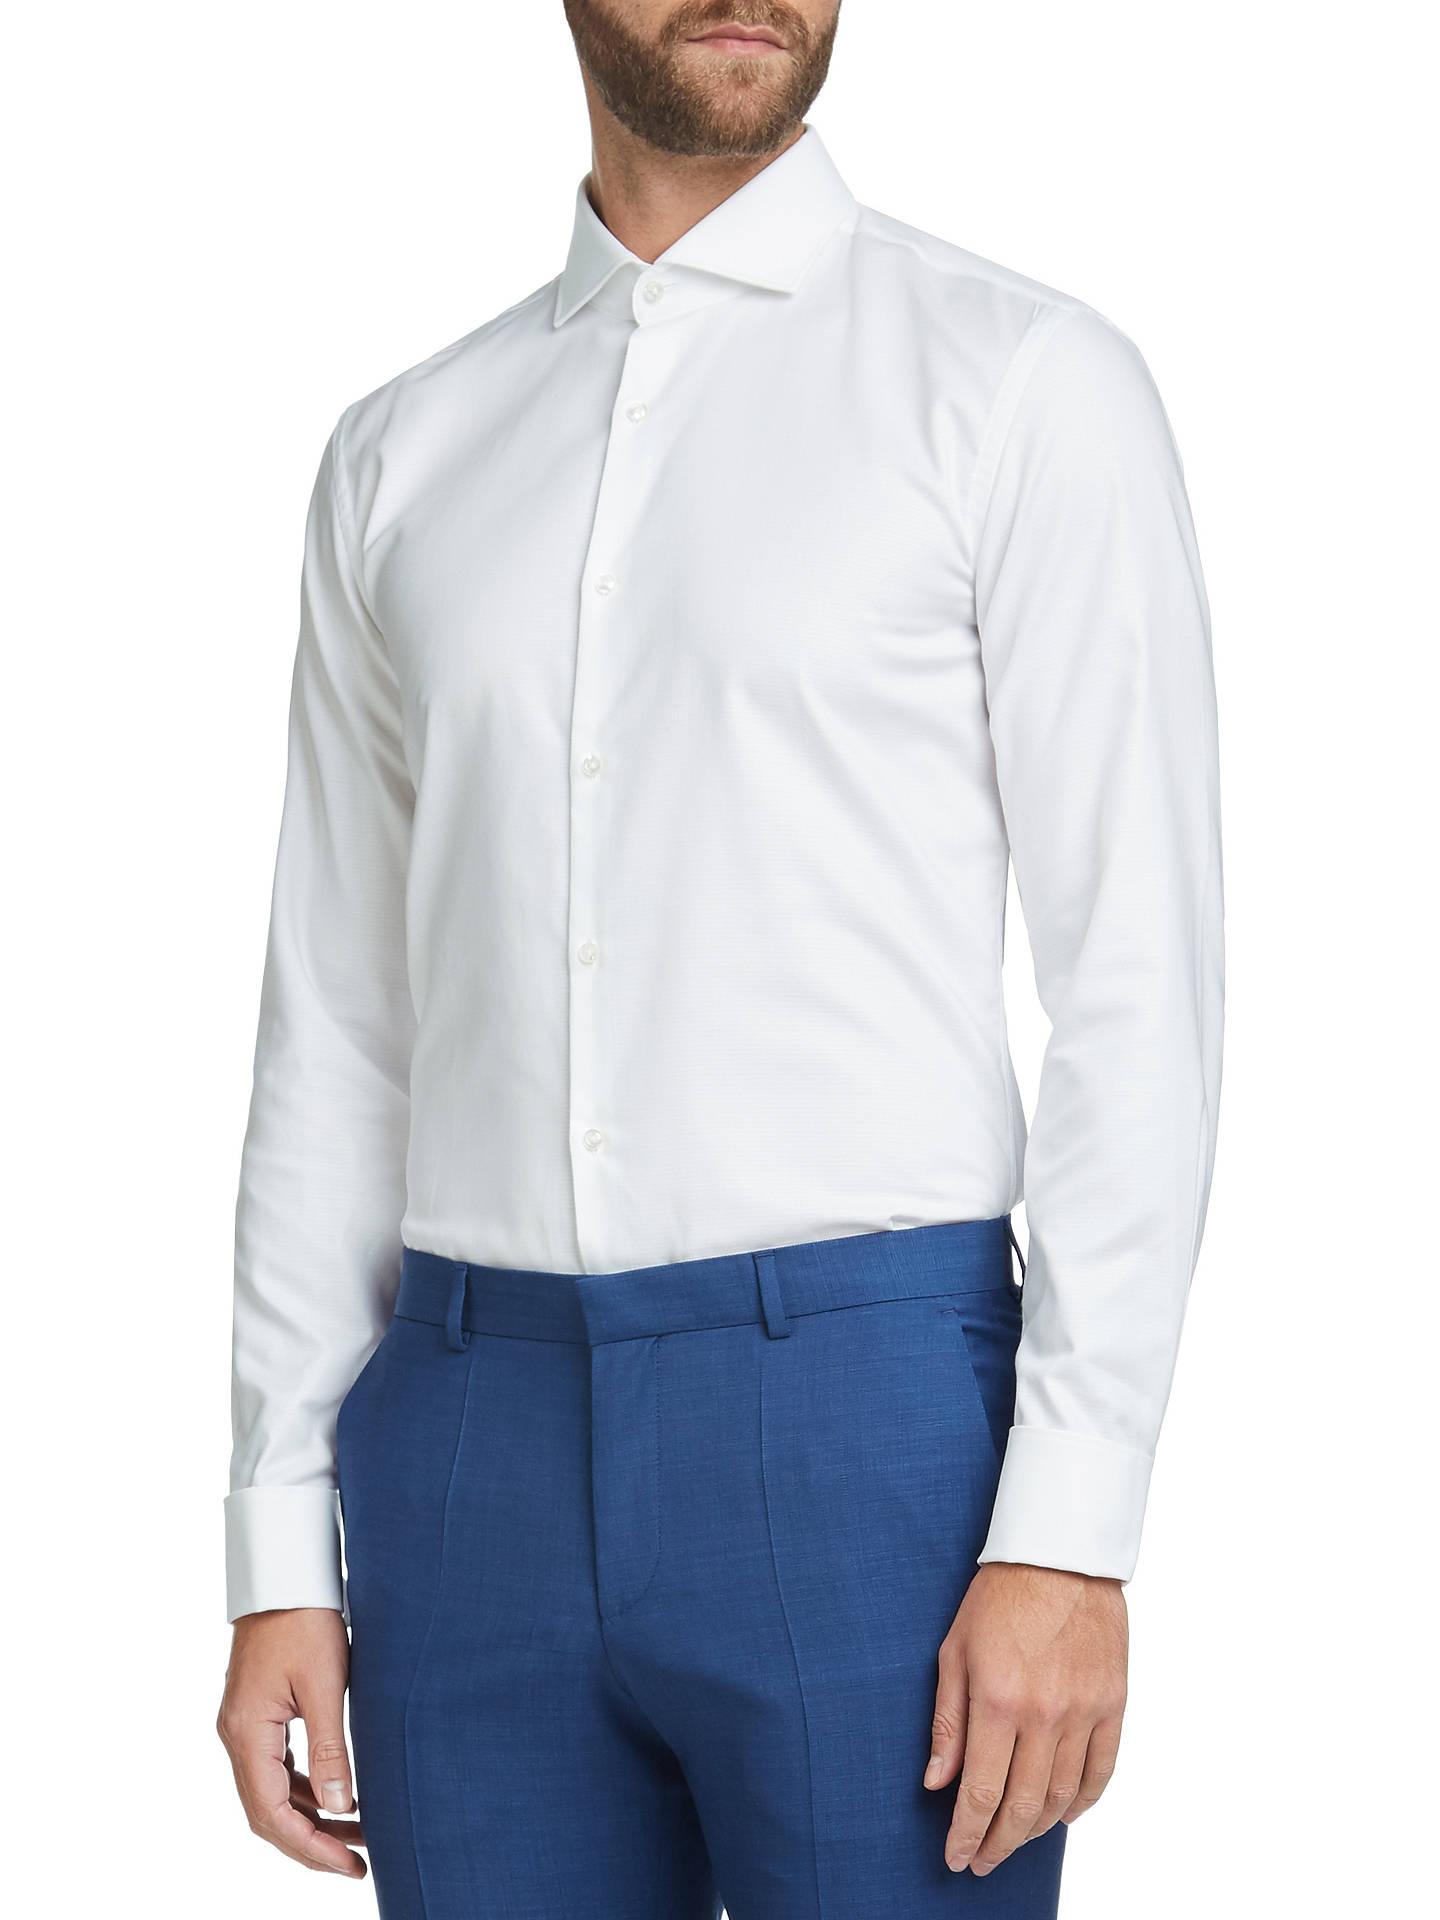 c9baa3ee1 HUGO by Hugo Boss C-Jales Slim Fit Dress Shirt, Open White at John ...